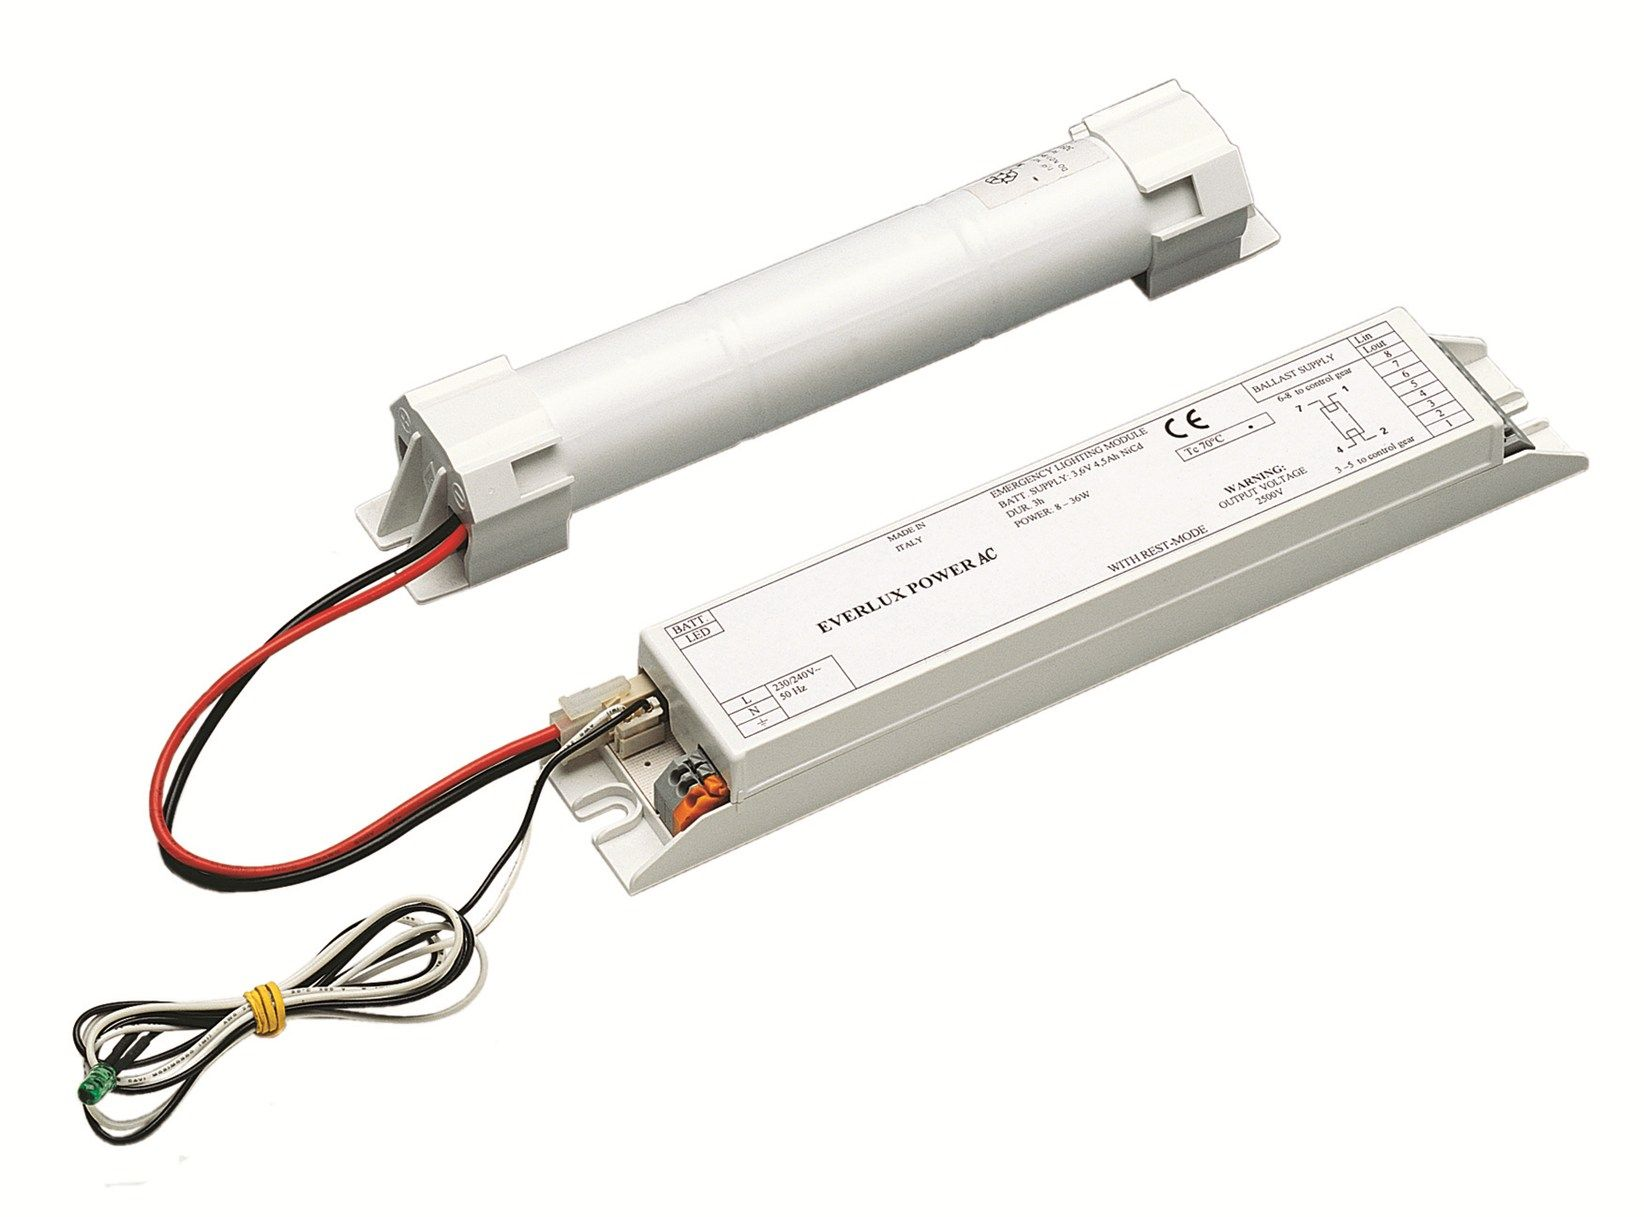 Plafoniere Con Luce Di Emergenza : Schneider electric presenta evx power ac kit di illuminazione